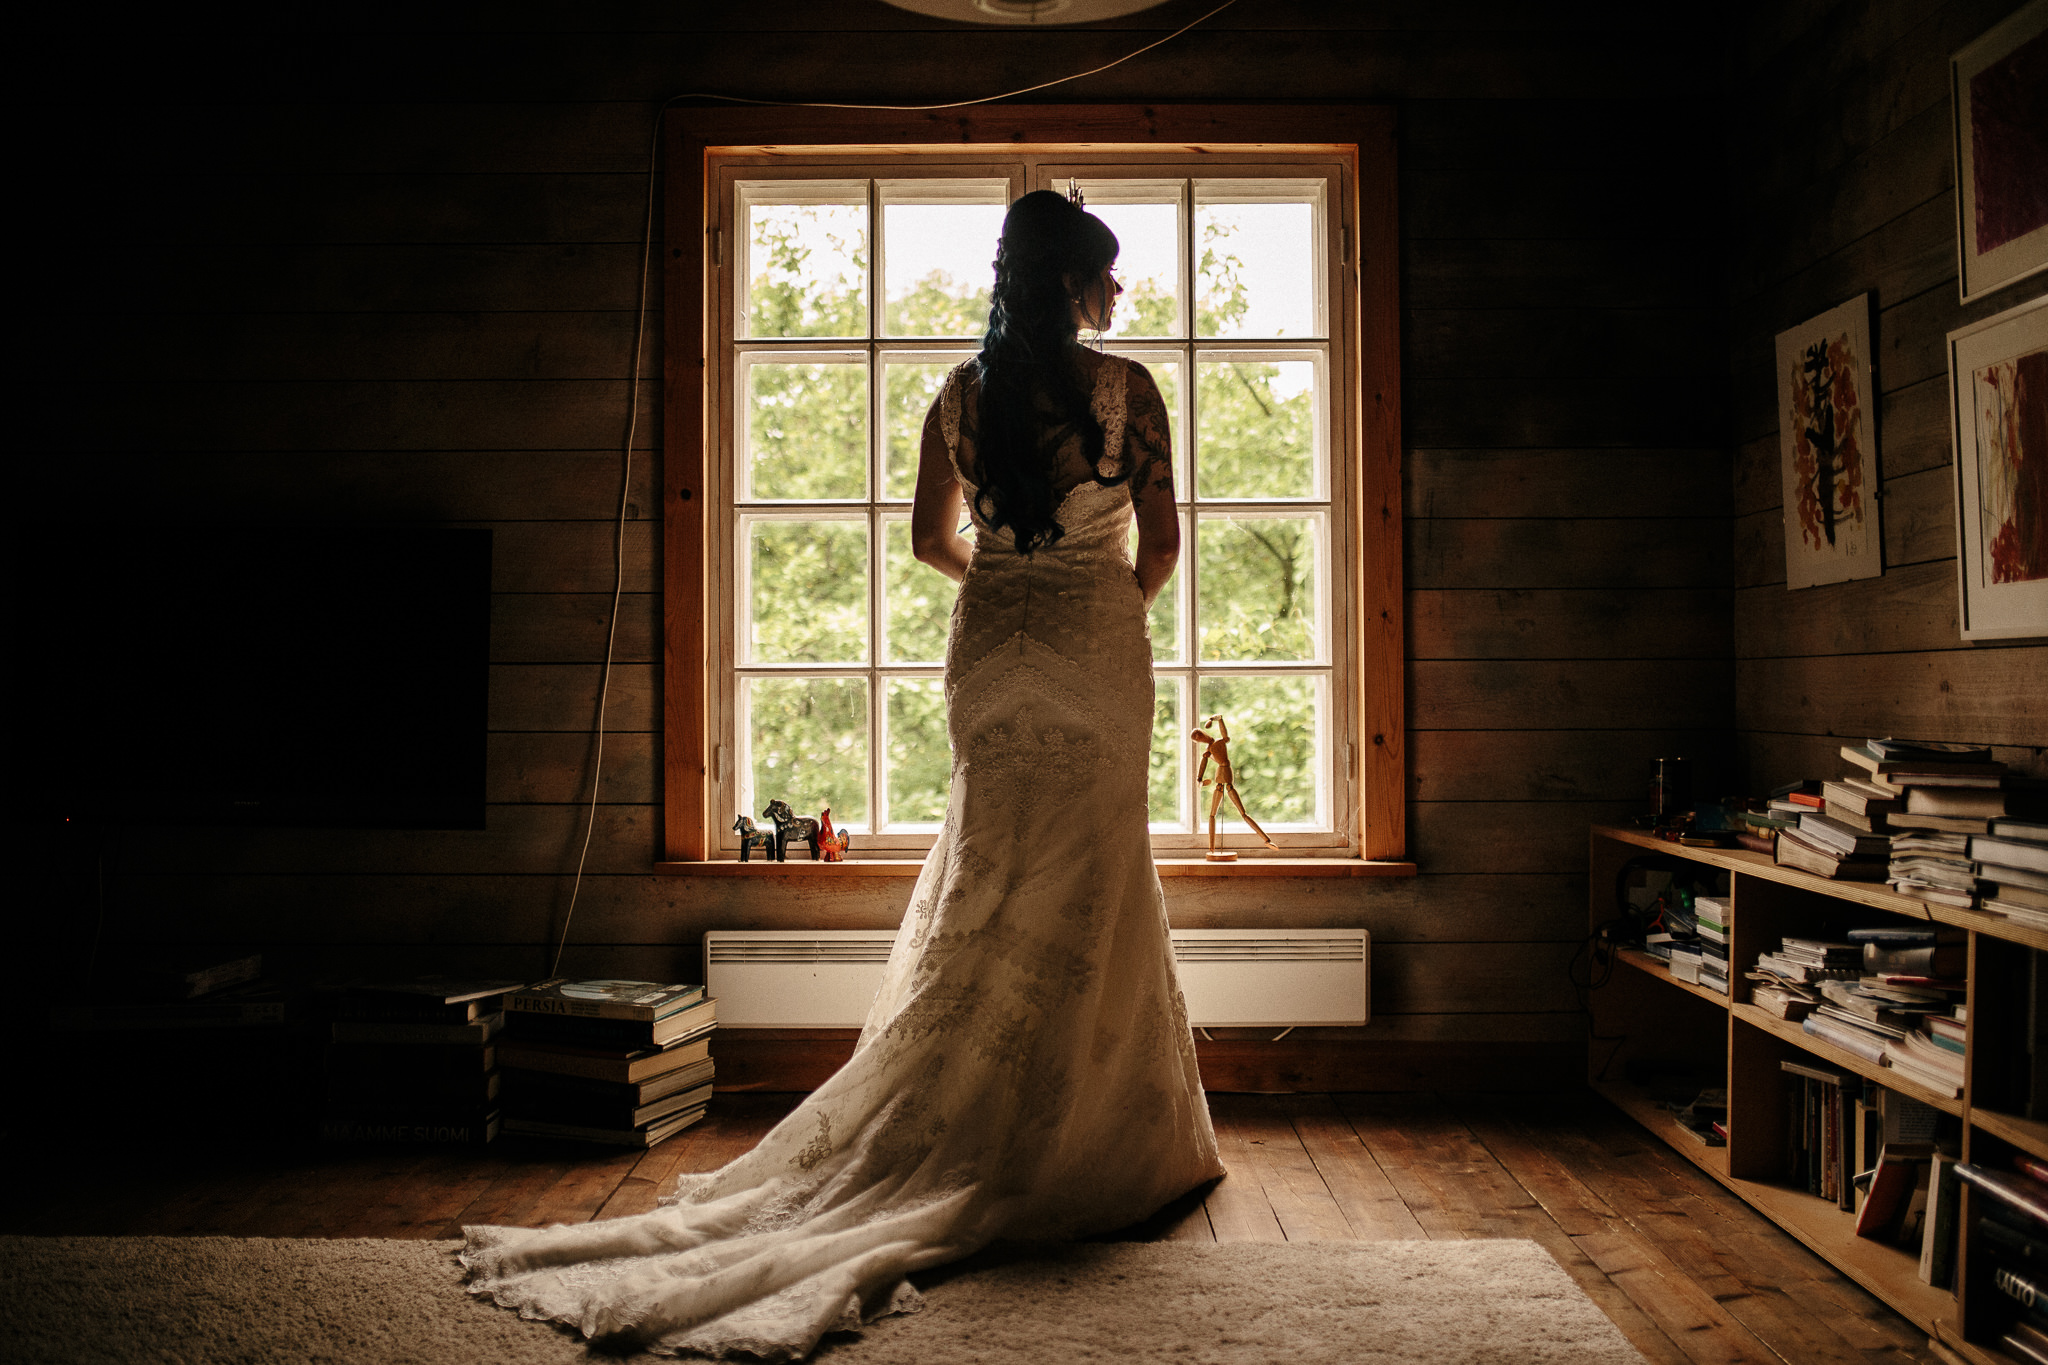 Ceren & Jani - Finland Wedding Photographer - Weddings by Qay - Wedding Photographer (44 of 166).jpg